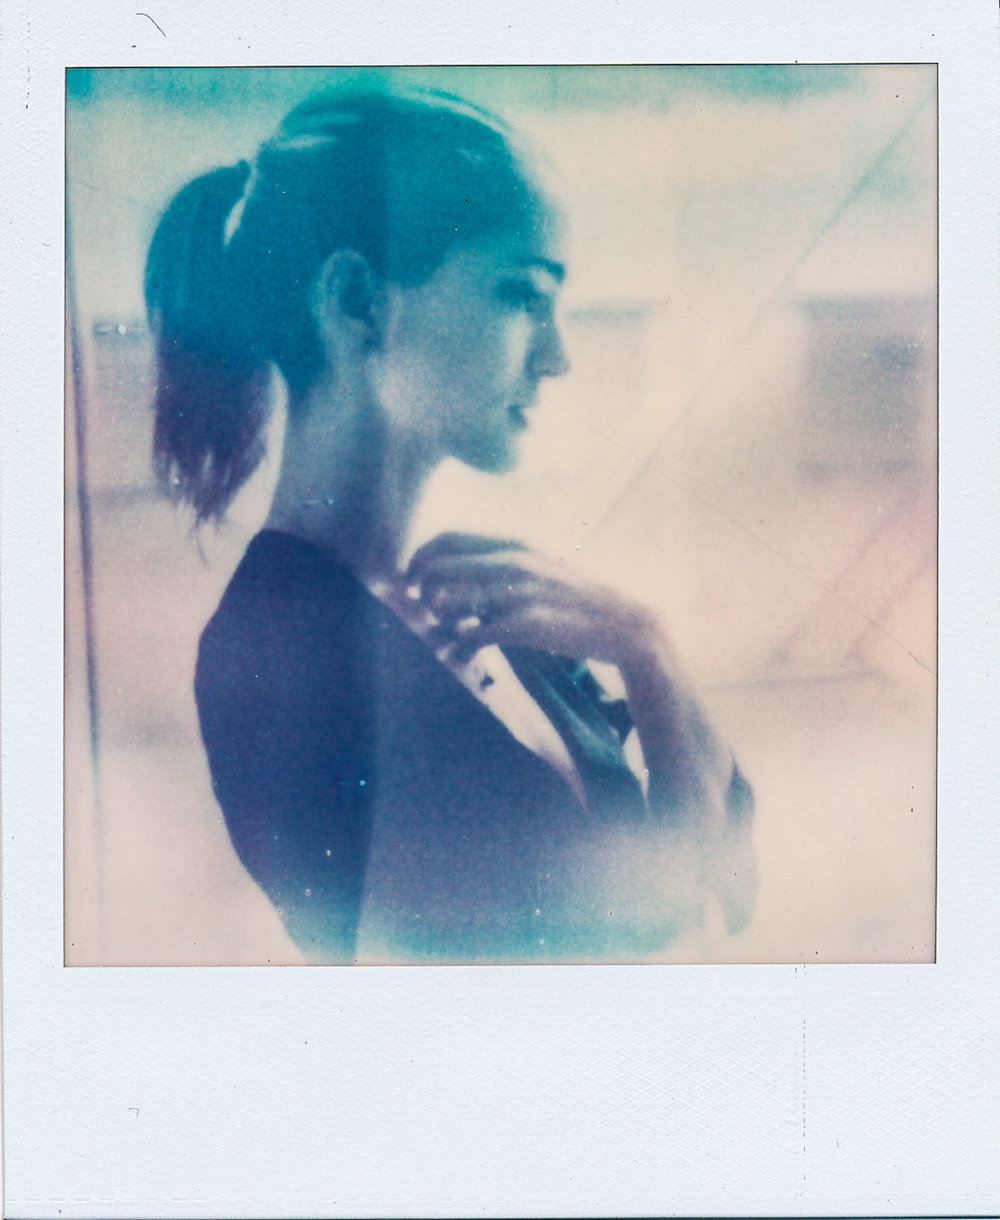 Sofia_Polaroids-4.jpg